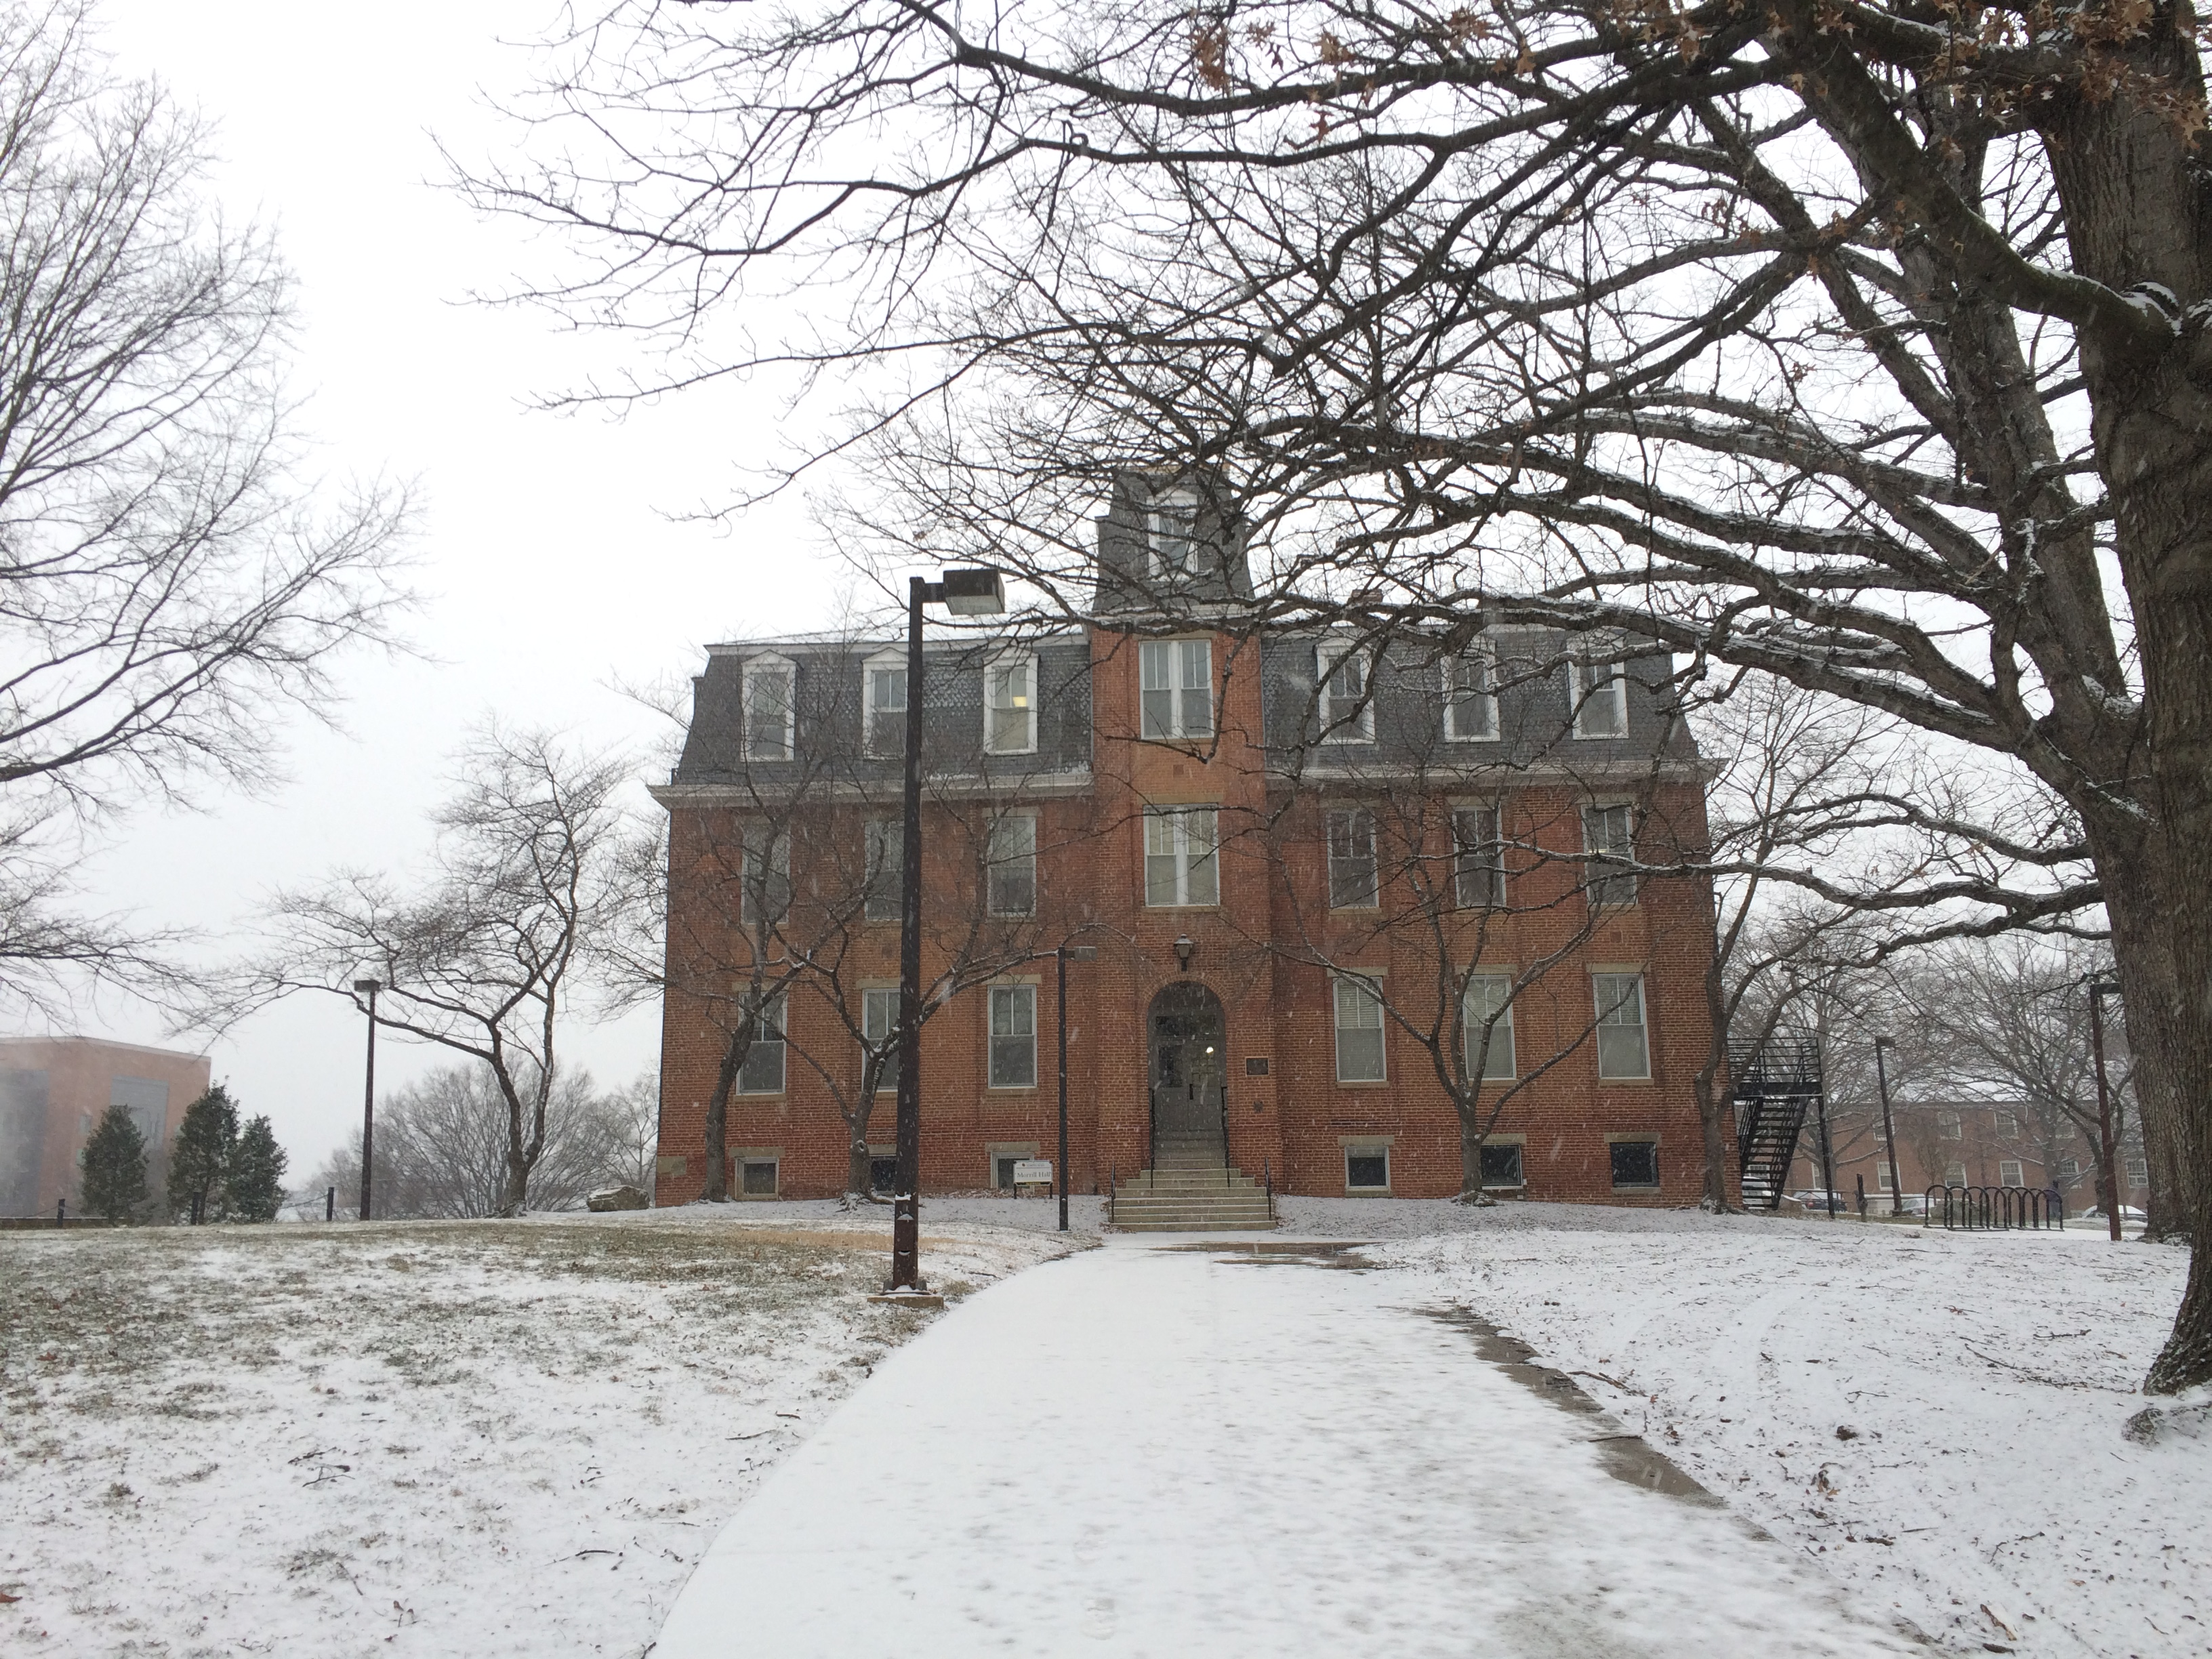 Morrill Hall (University of Maryland) - Wikipedia on umd duluth campus map, umd map of location, umd maryland location map,